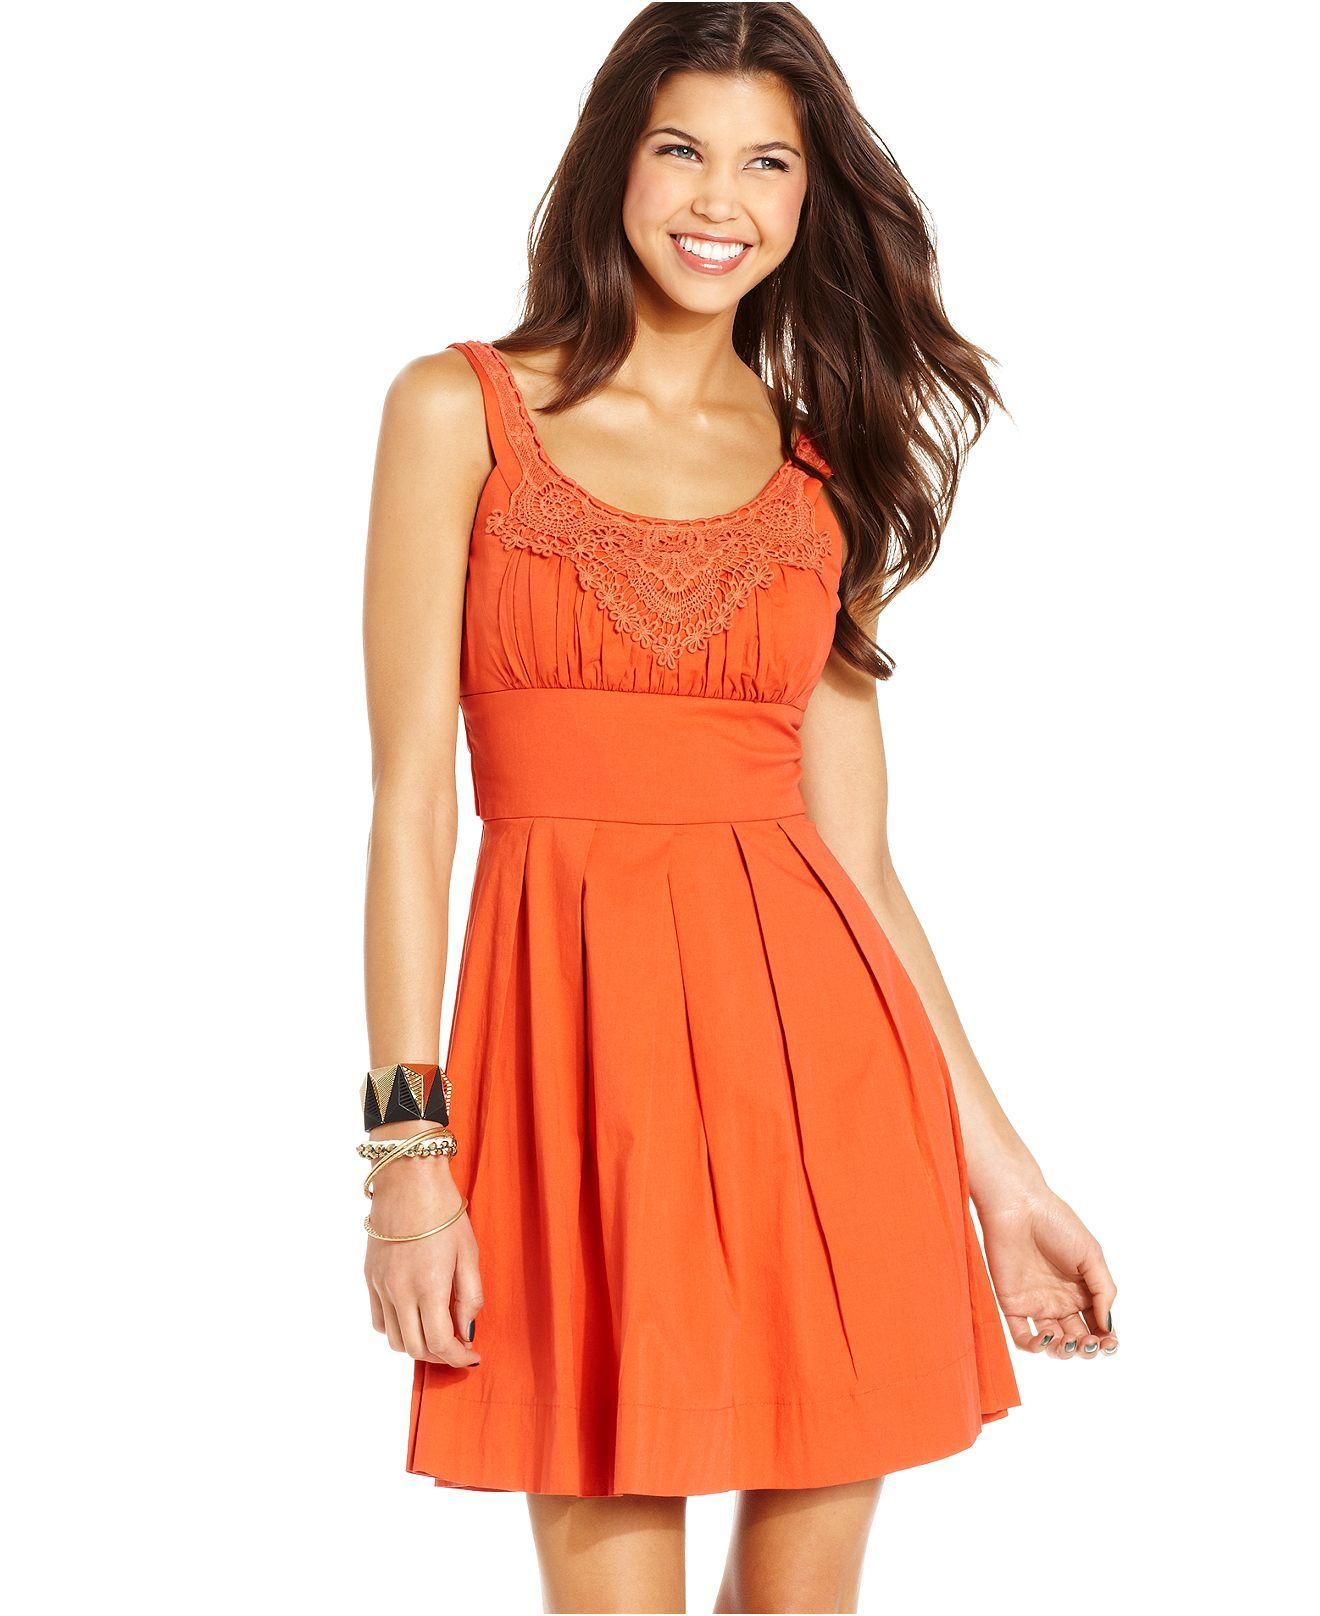 Trixxi Juniors Dress Sleeveless Pleated Crochet Knit Juniors Dresses Macy S Junior Dresses Trixxi Dress Review Dresses [ 1616 x 1320 Pixel ]